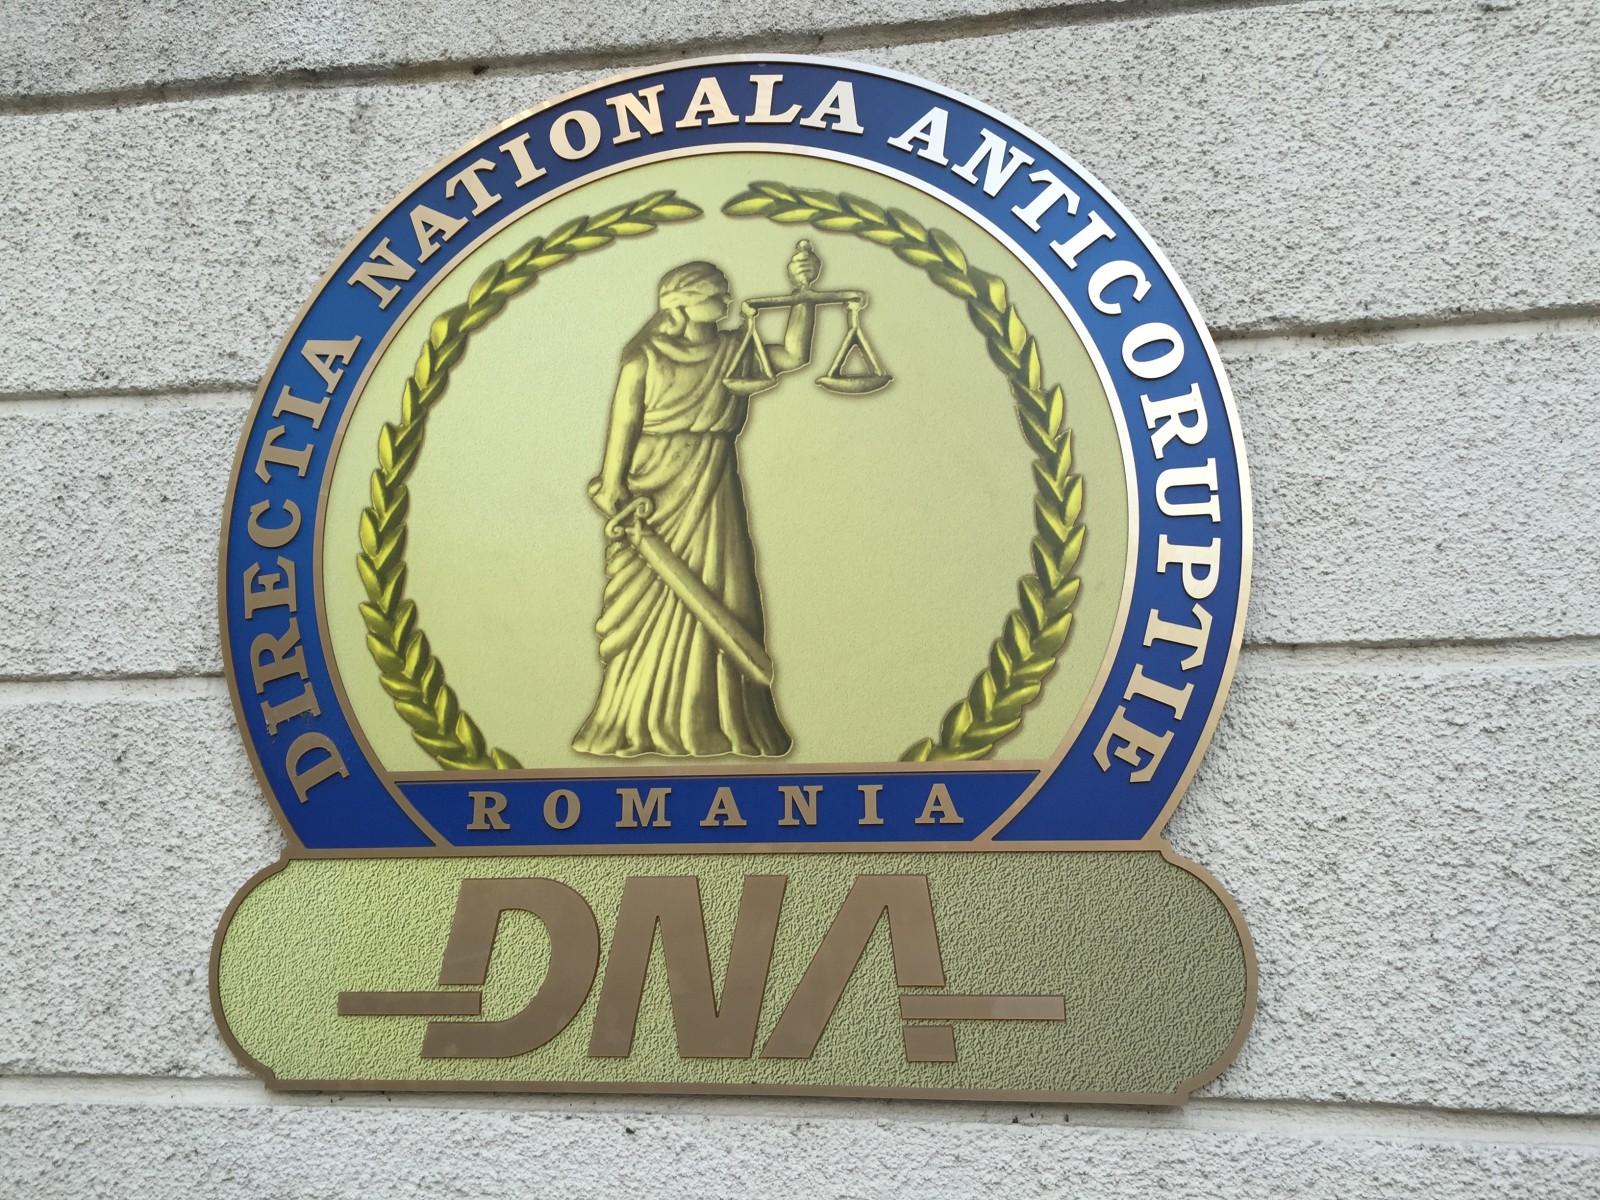 DNA : parquet anti-corruption